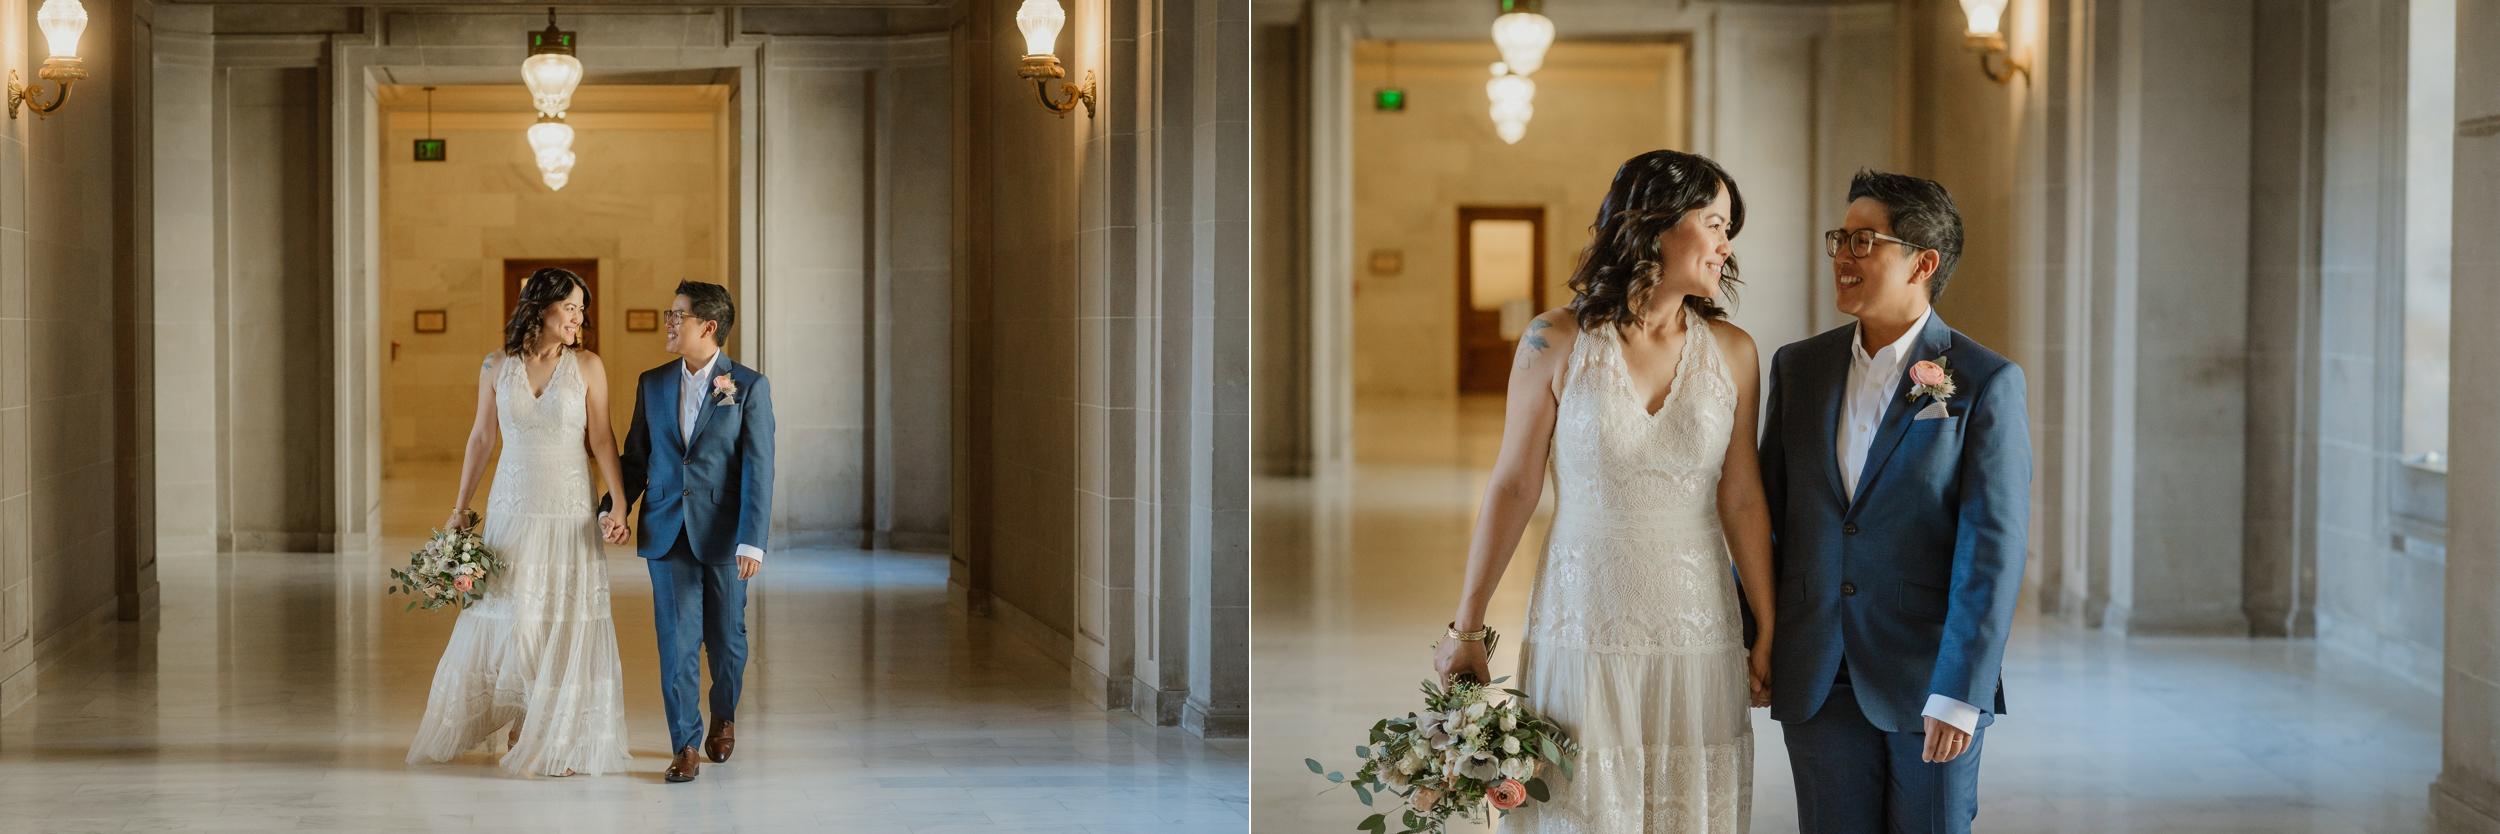 028-28-san-francisco-city-hall-stable-cafe-wedding-vivianchen-273_WEB.jpg